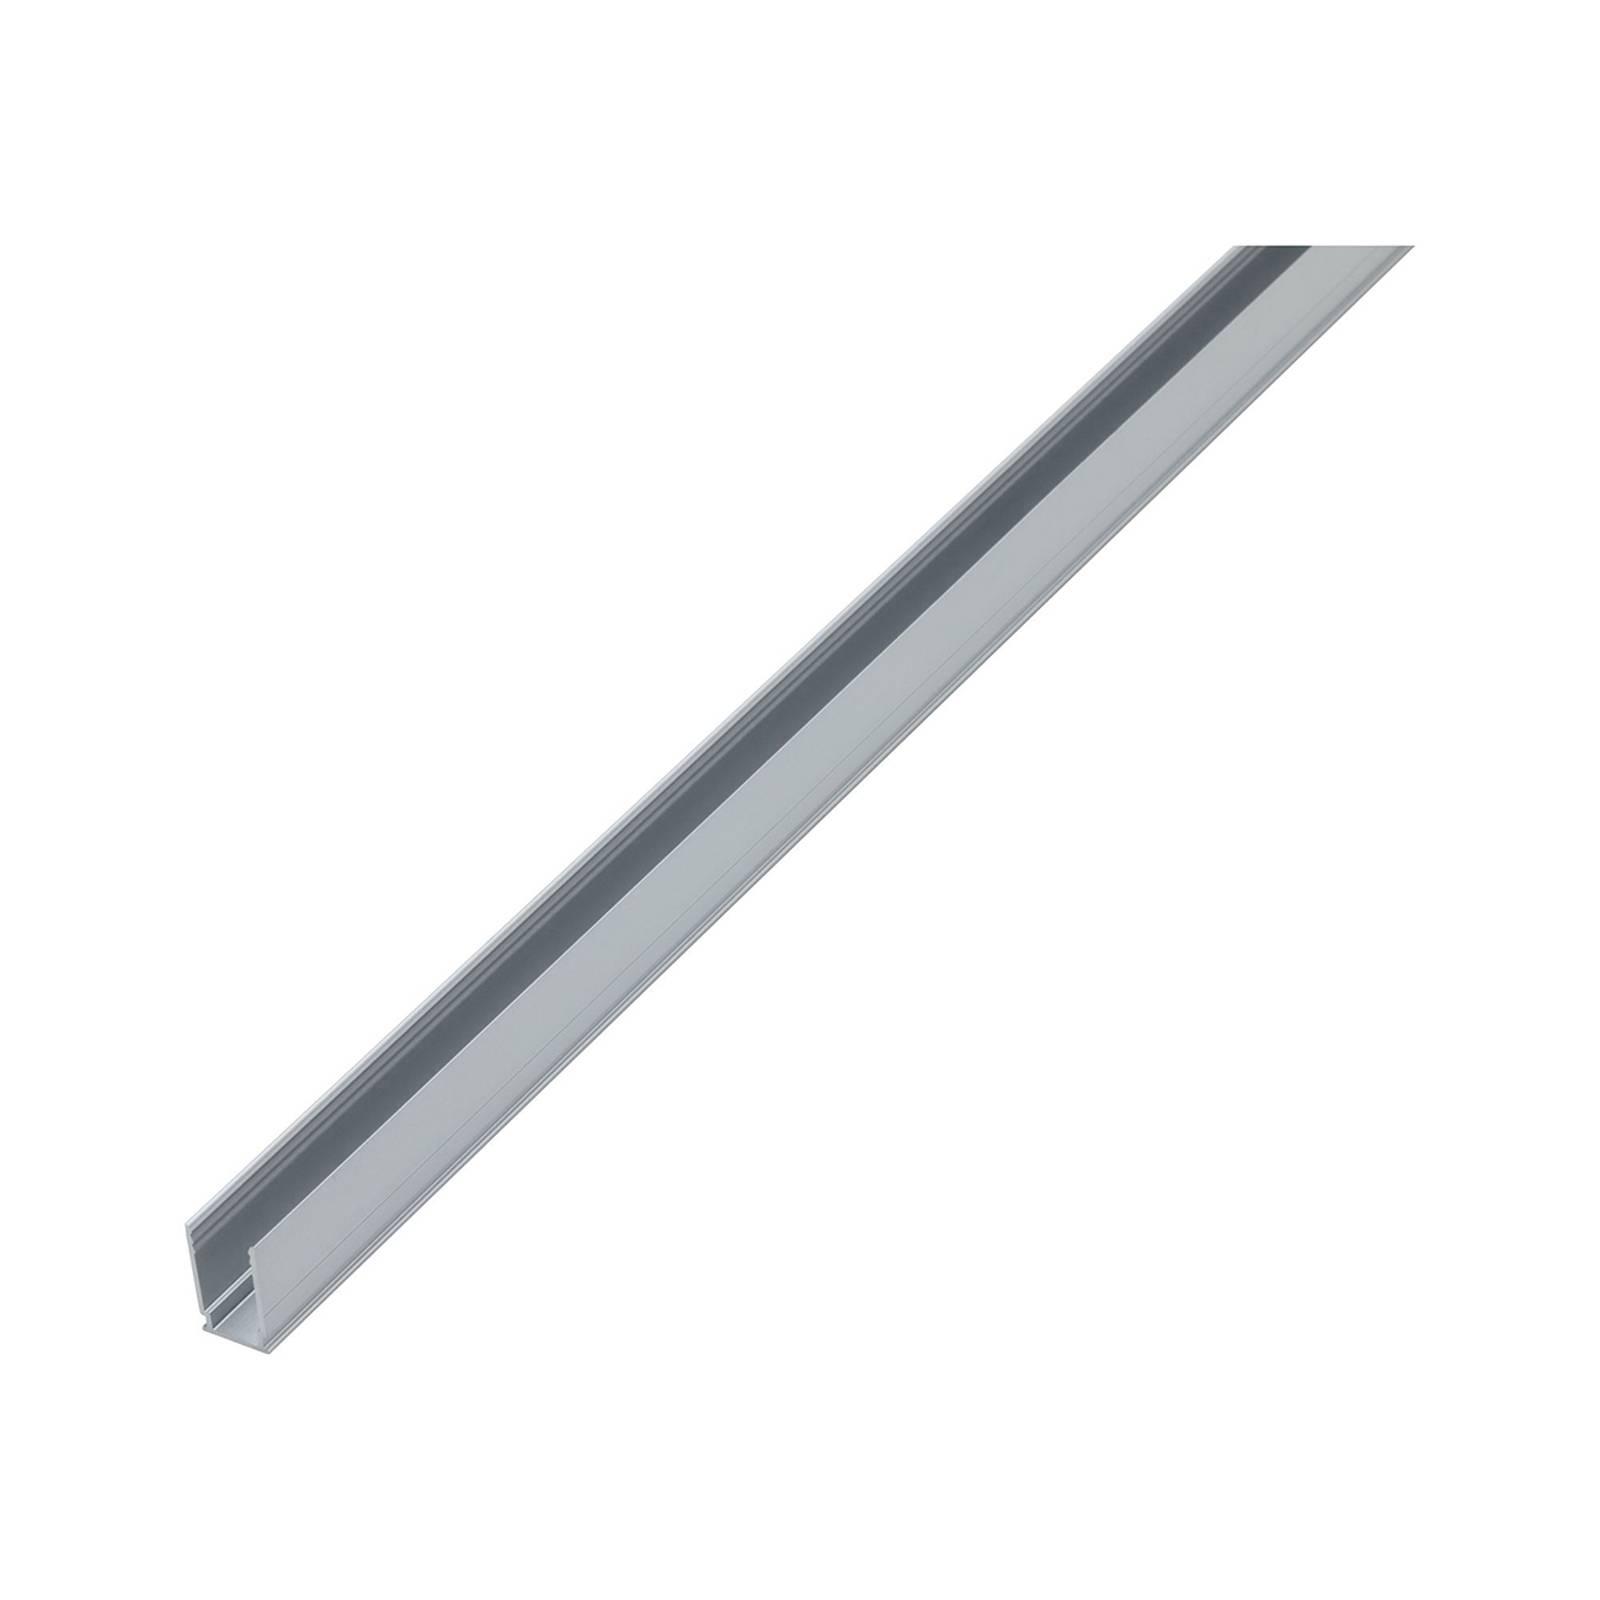 Paulmann Profil 94216 für Plug & Shine Neon-Stripe